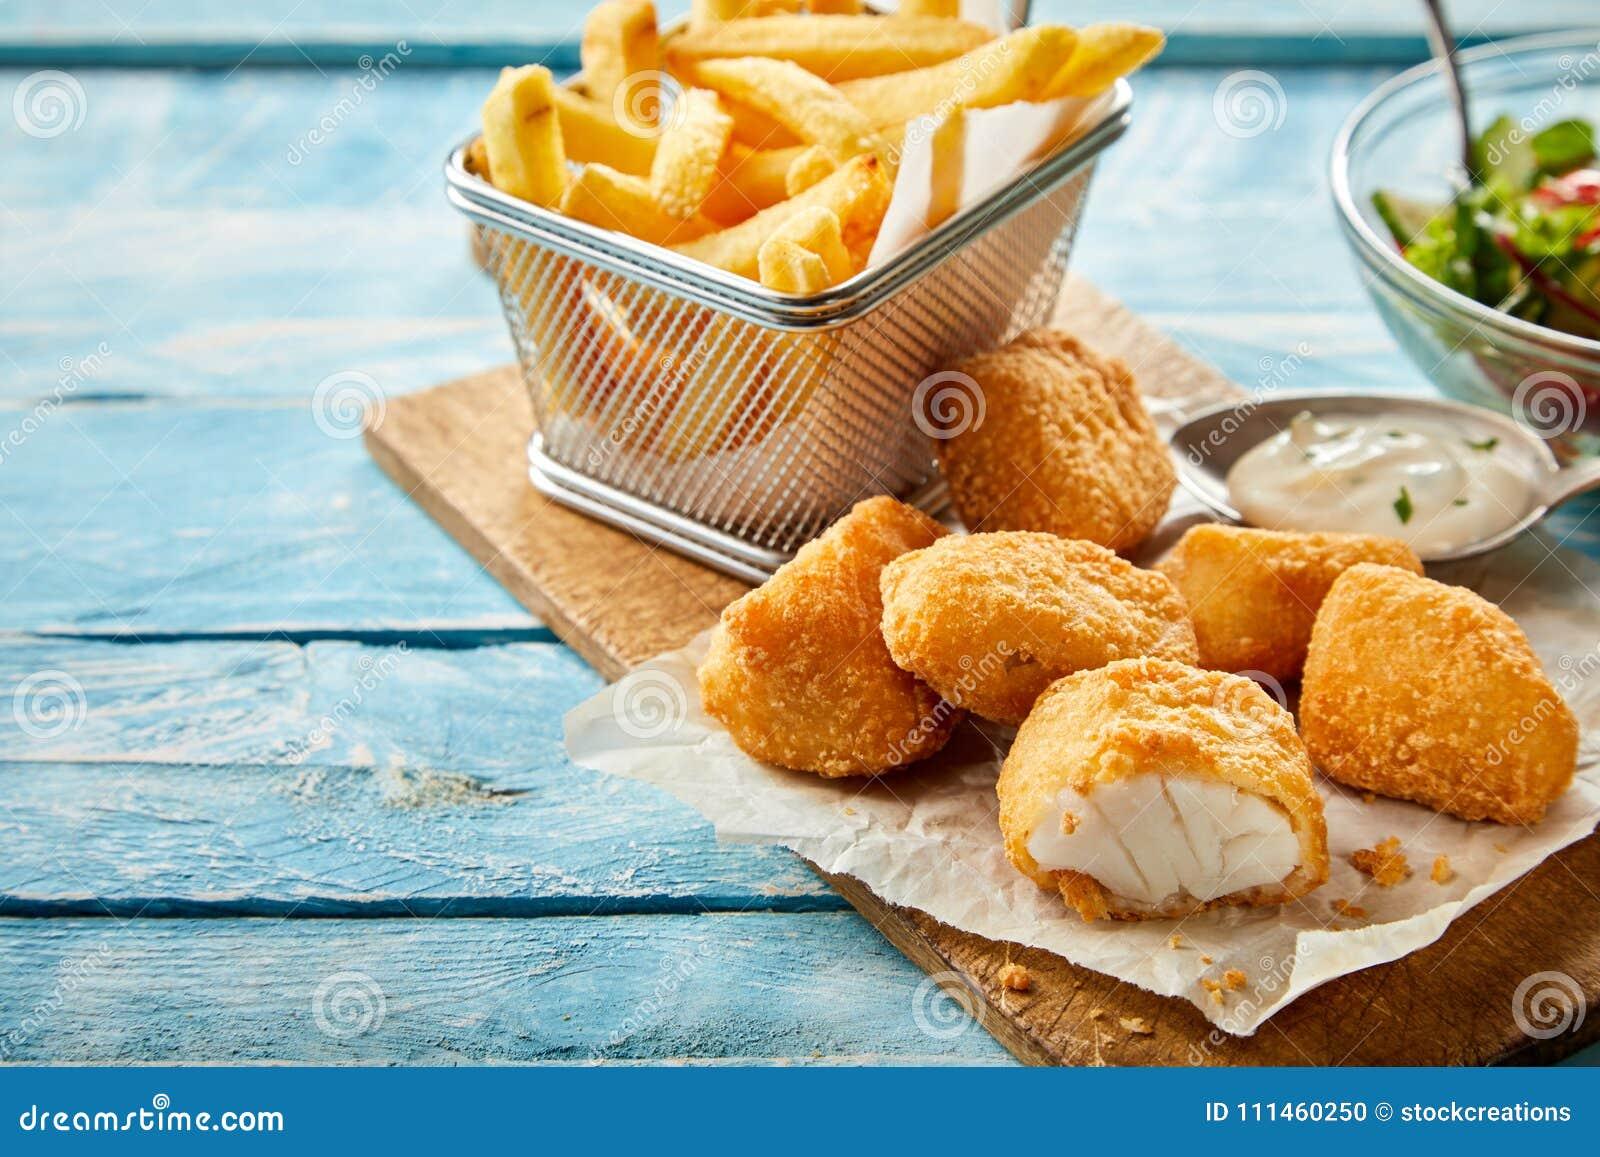 Rustic serving of crumbed fried kibbeling